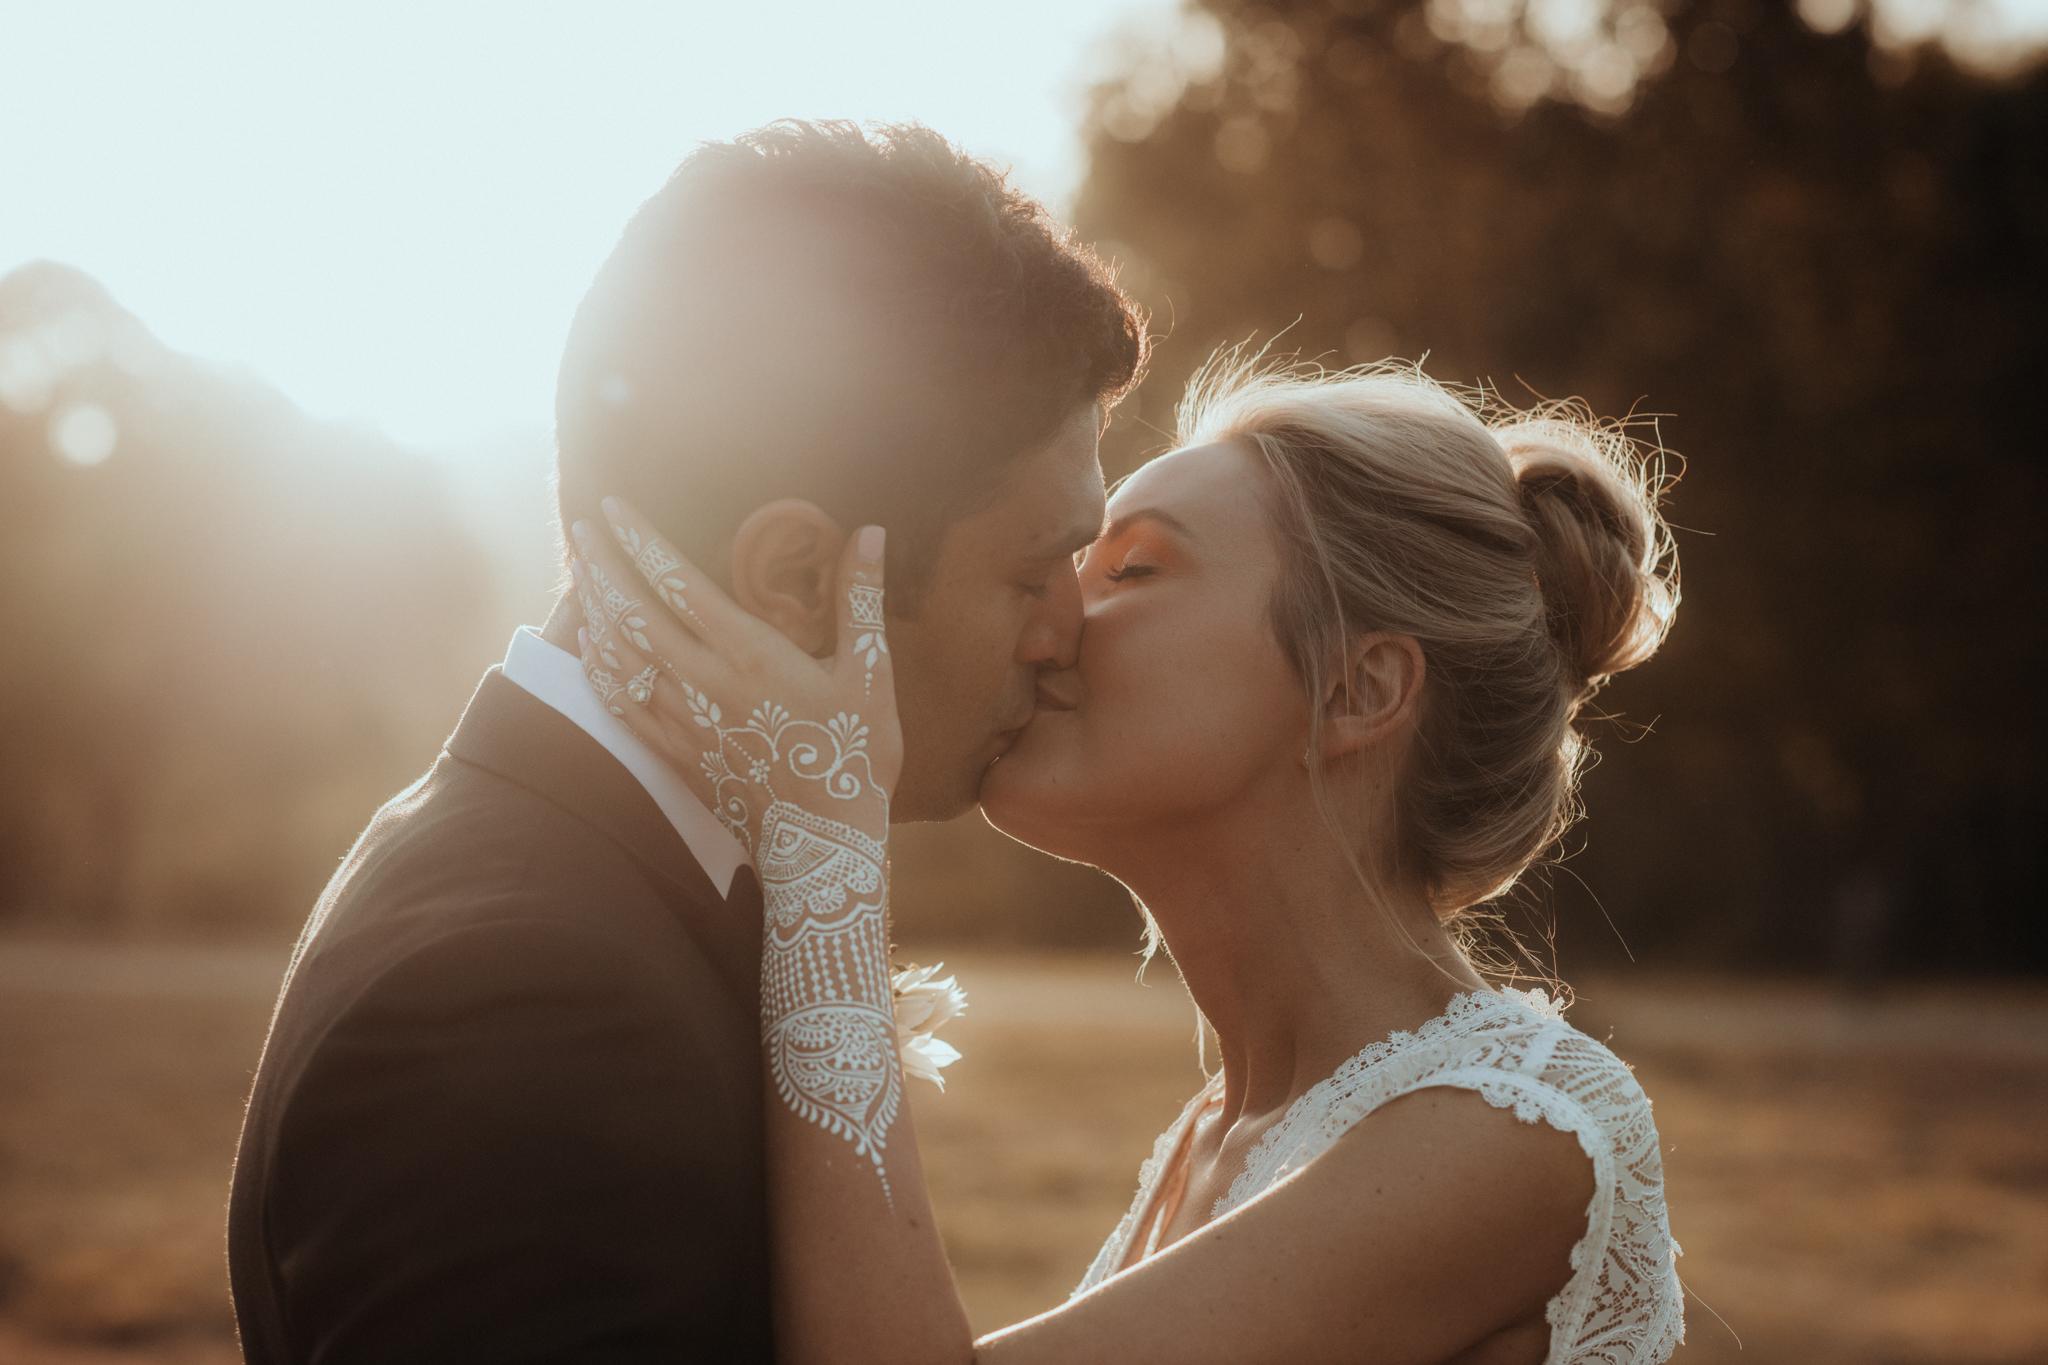 BRISBANE WEDDING PHOTOGRAPHER • BUNDALEER RAINFOREST GARDENS WEDDING • ONE DAY BRIDAL WEDDING GOWN • ROXY HOTTEN CELEBRANT • LOVELENSCAPES PHOTOGRAPHY • 134.jpg